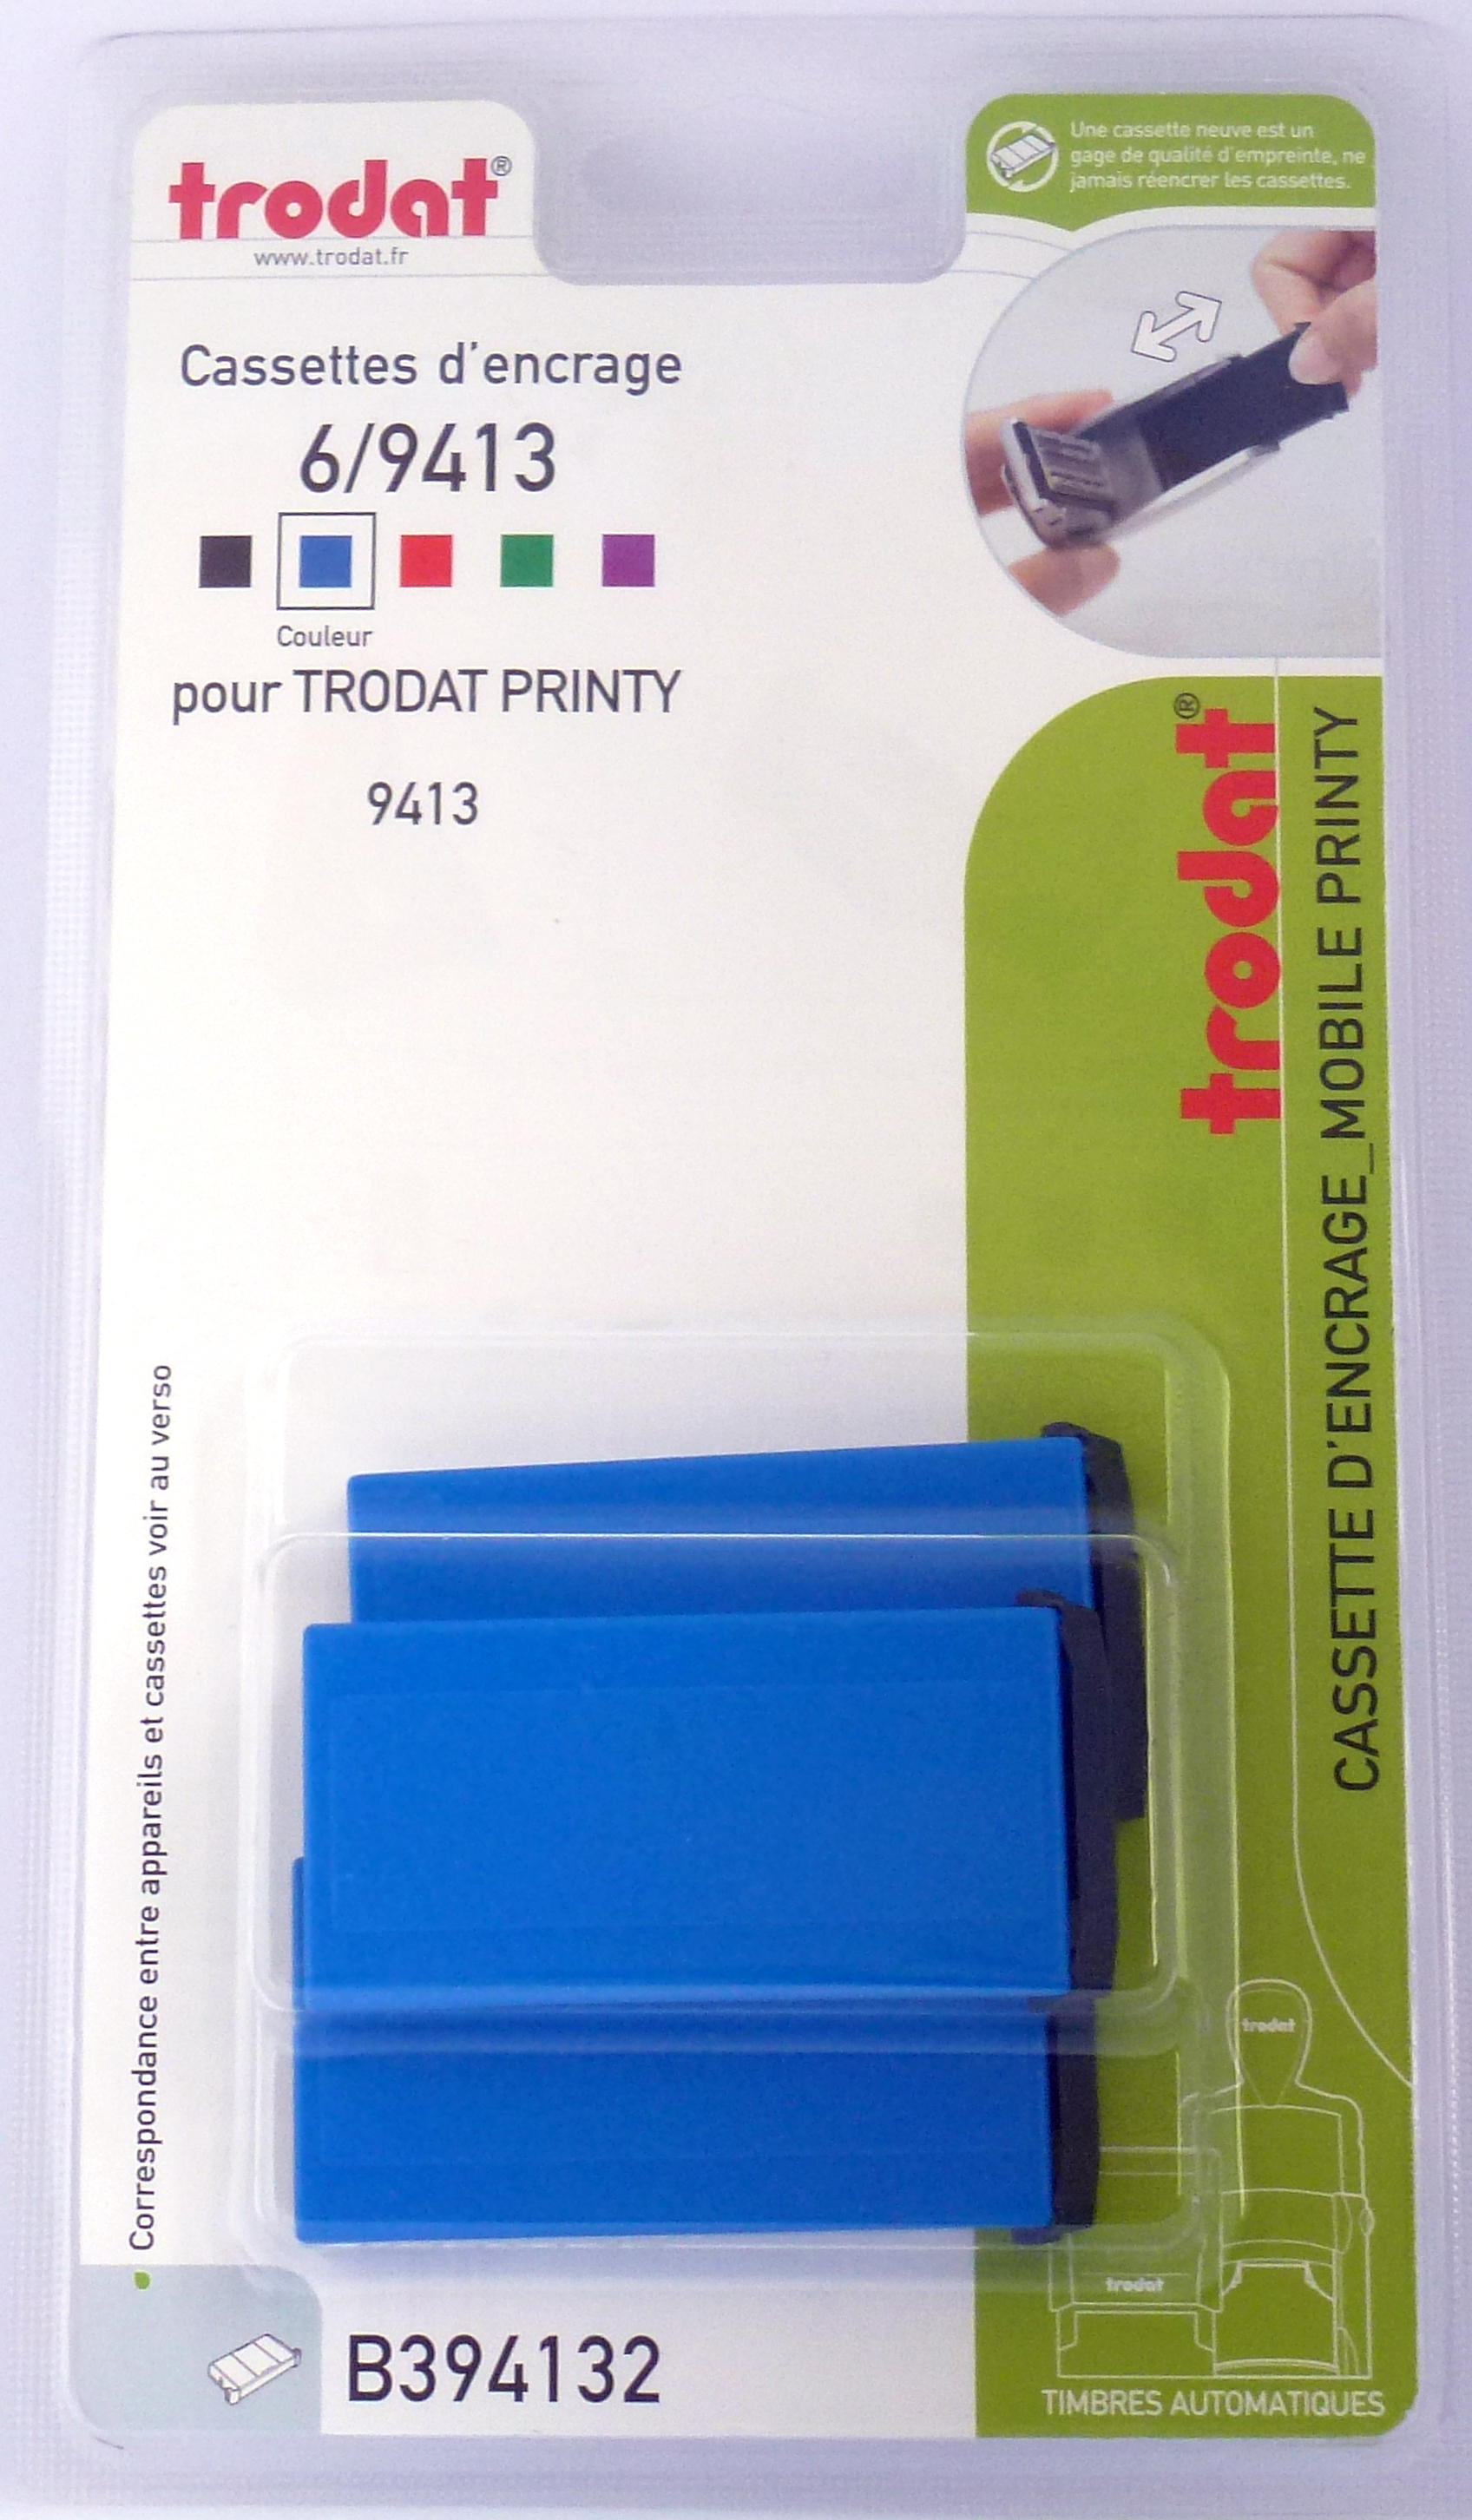 Trodat - 3 Encriers 6/9413 recharges pour tampon Mobile Printy 9413 - bleu